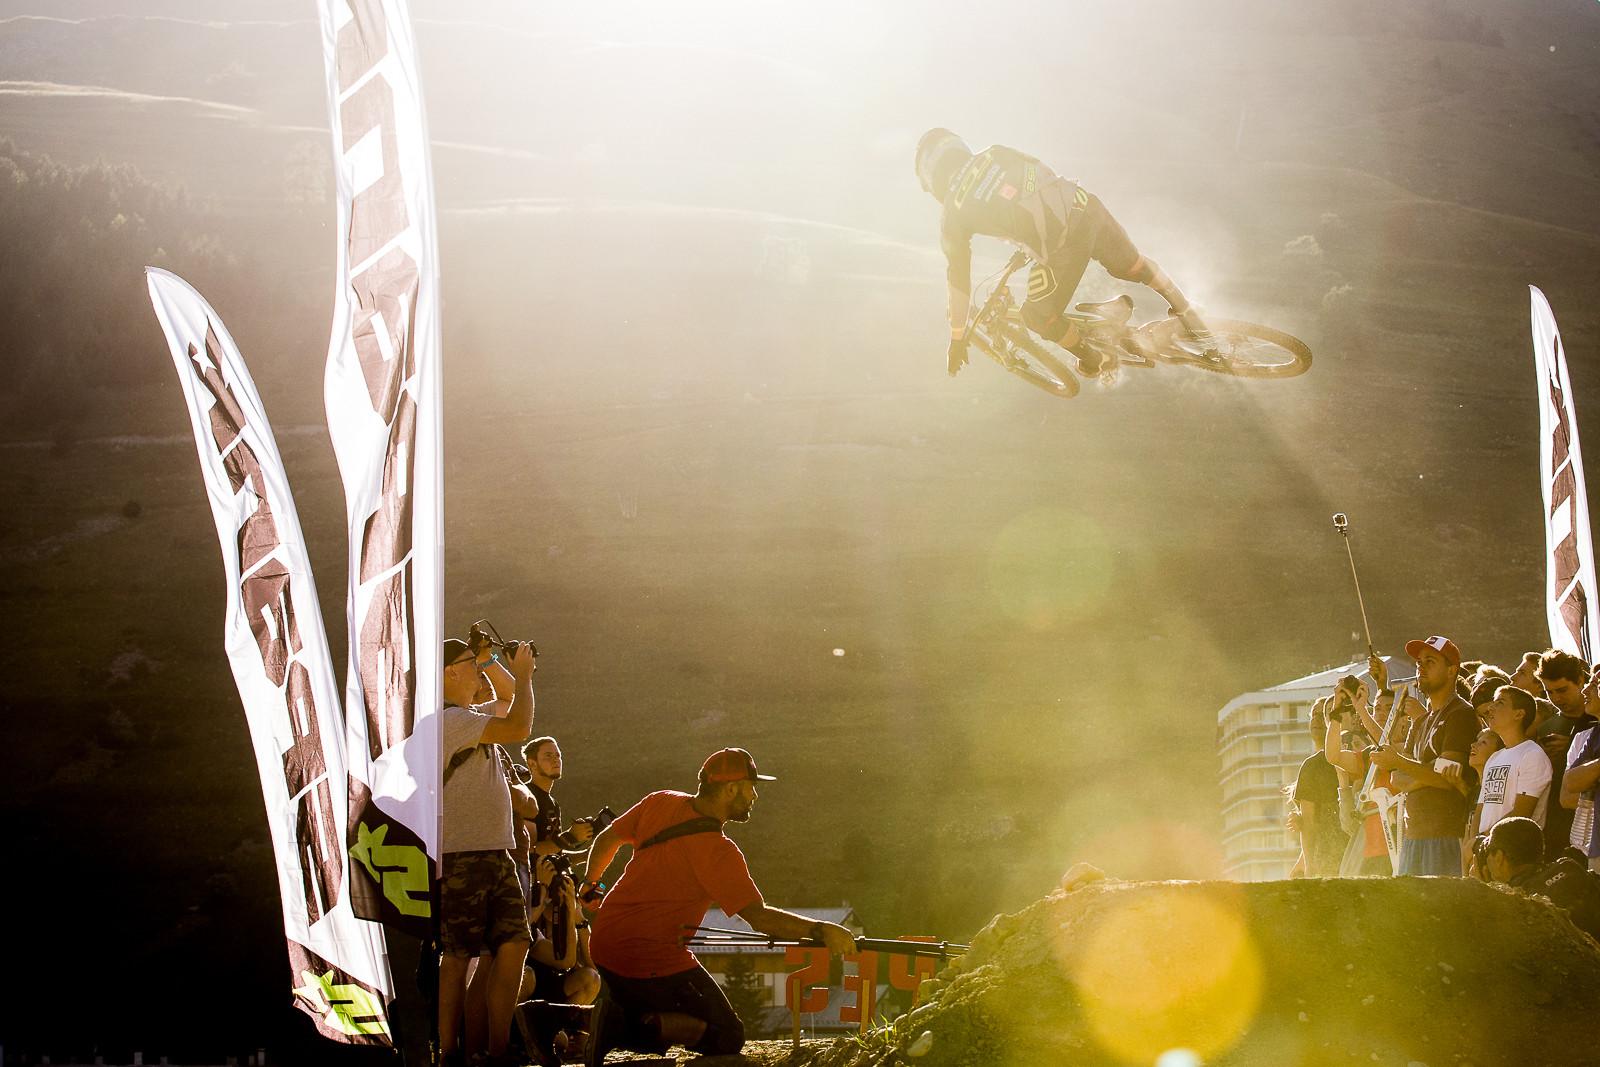 Bernardo Cruz, Whip Off European Champs, Crankworx L2A - Whip Off European Champs, Crankworx L2A - Mountain Biking Pictures - Vital MTB